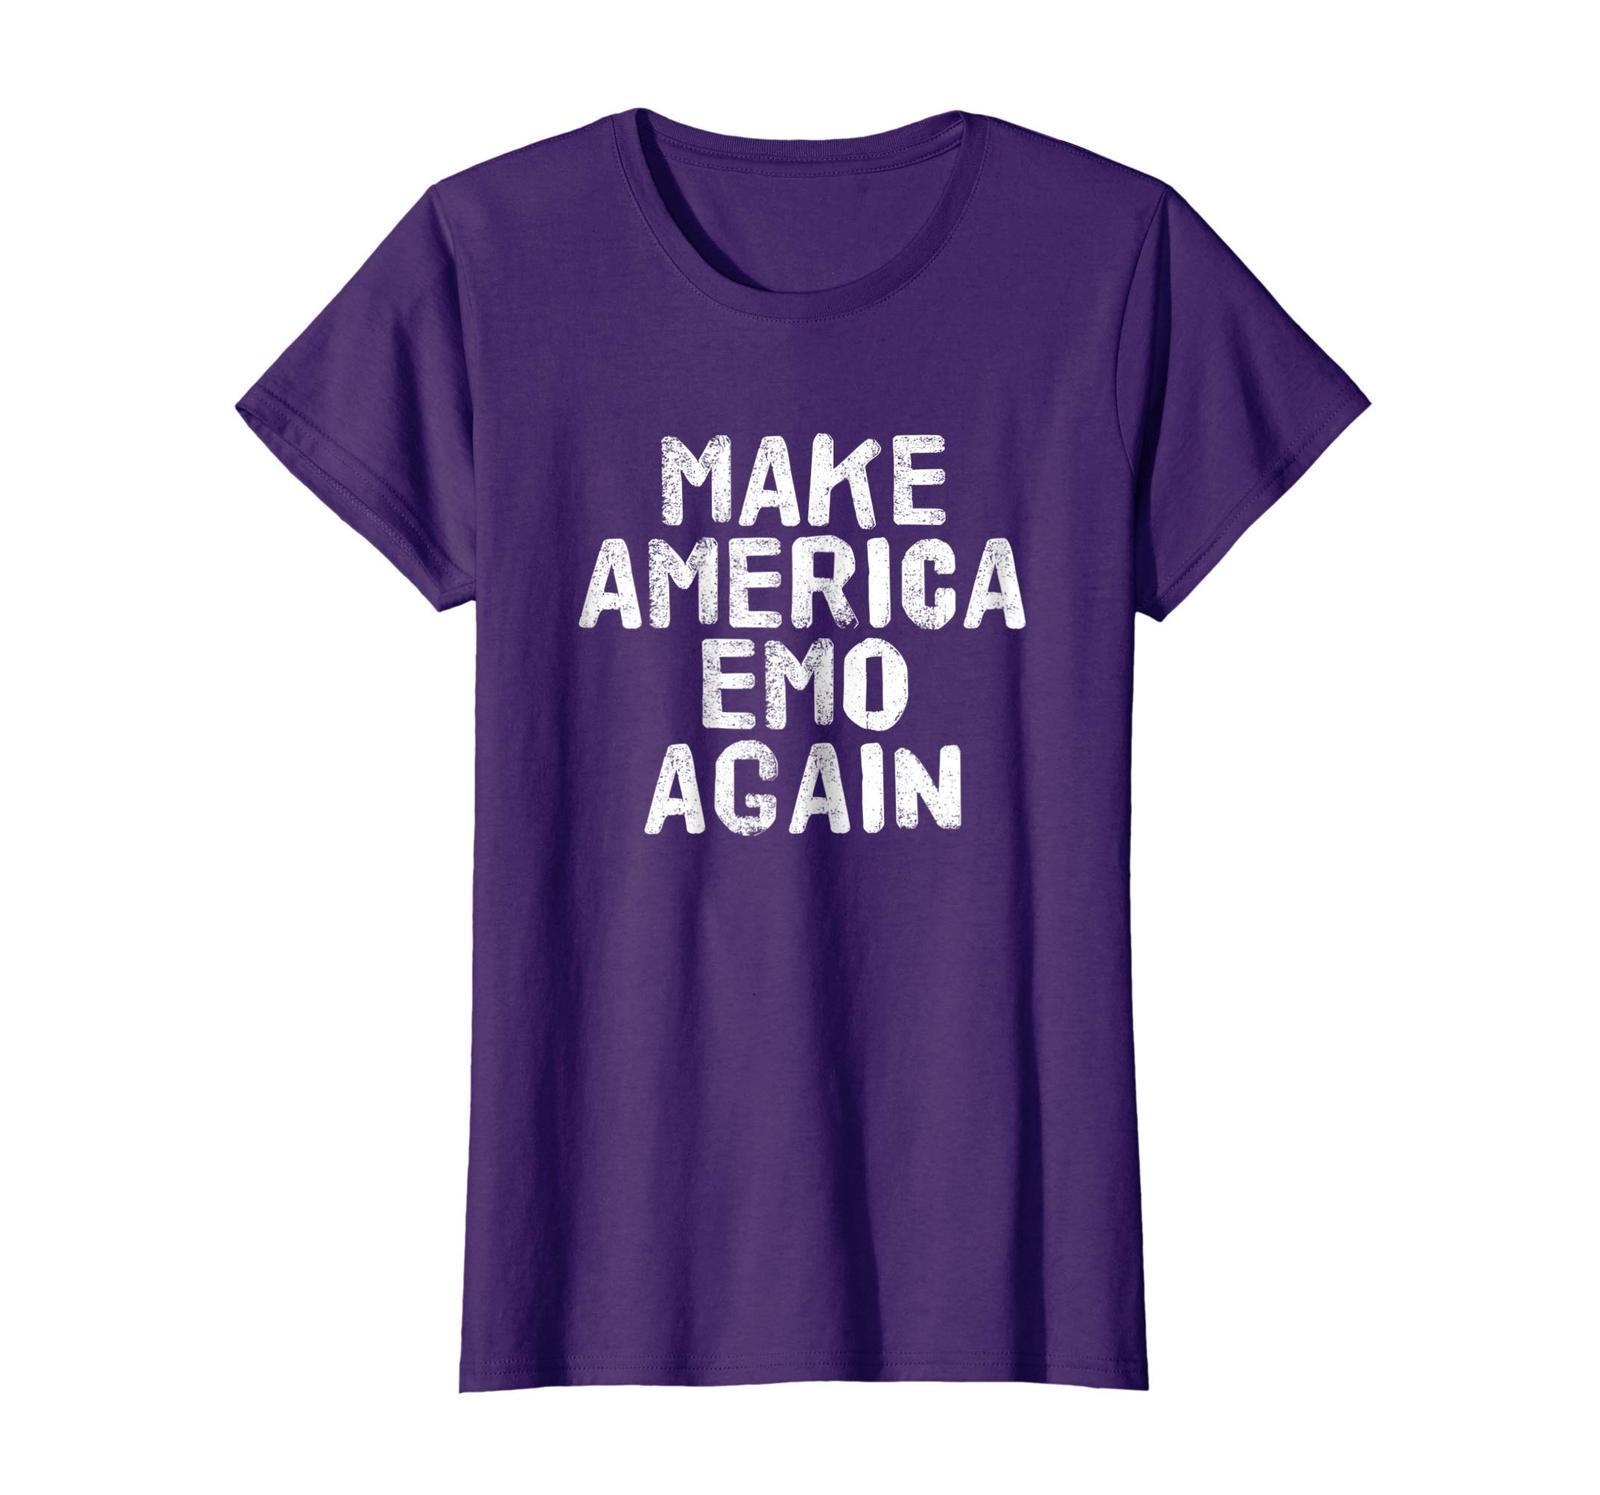 Brother Shirts - MAKE AMERICA EMO AGAIN Shirt Funny Goth US Gift Idea Wowen